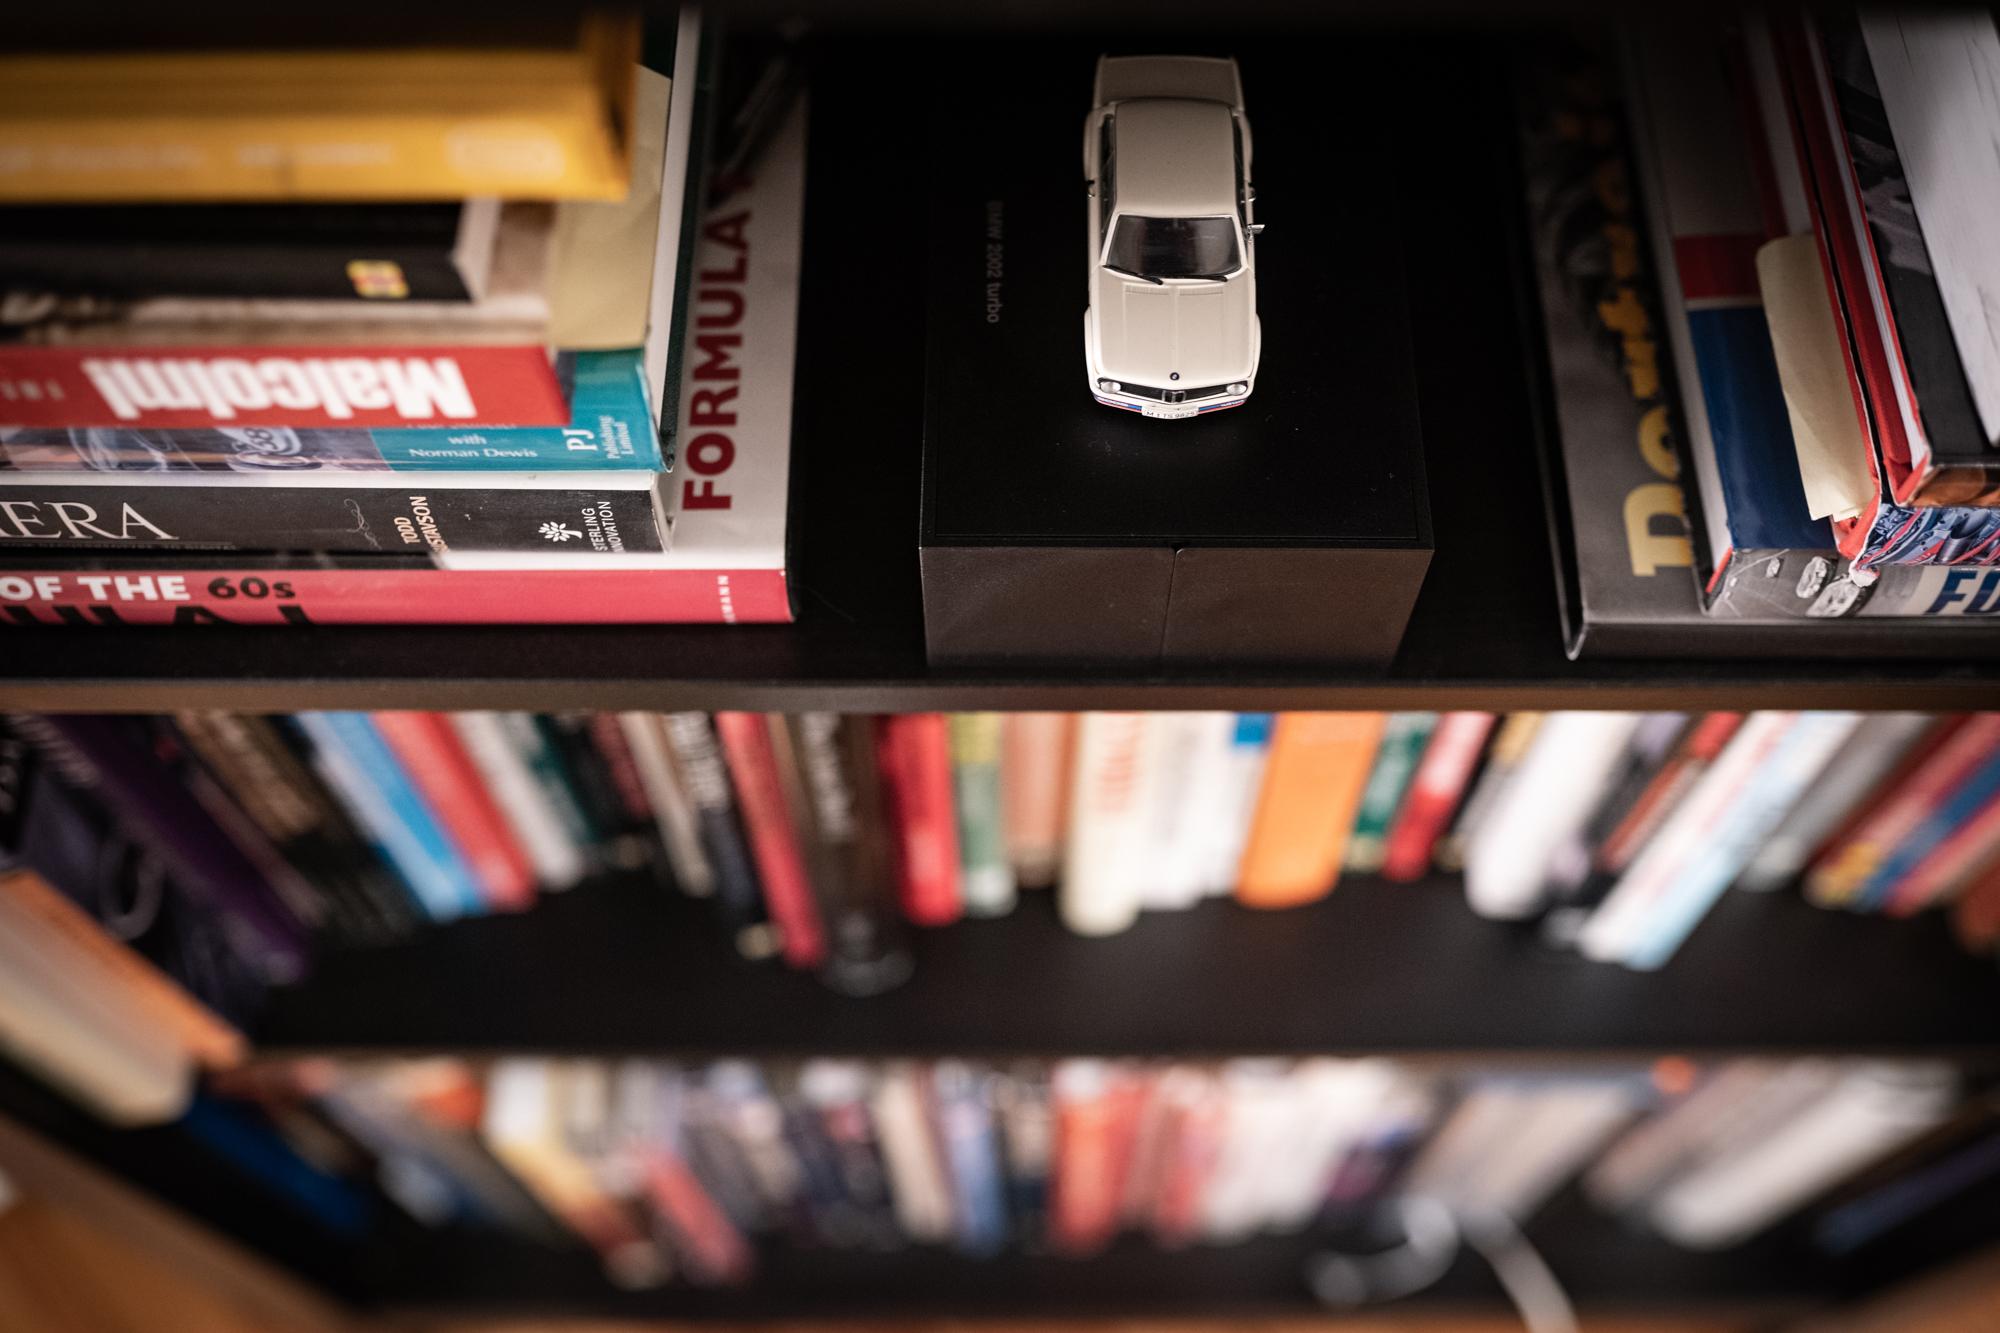 white bmw 2002 miniature on bookcase shelf